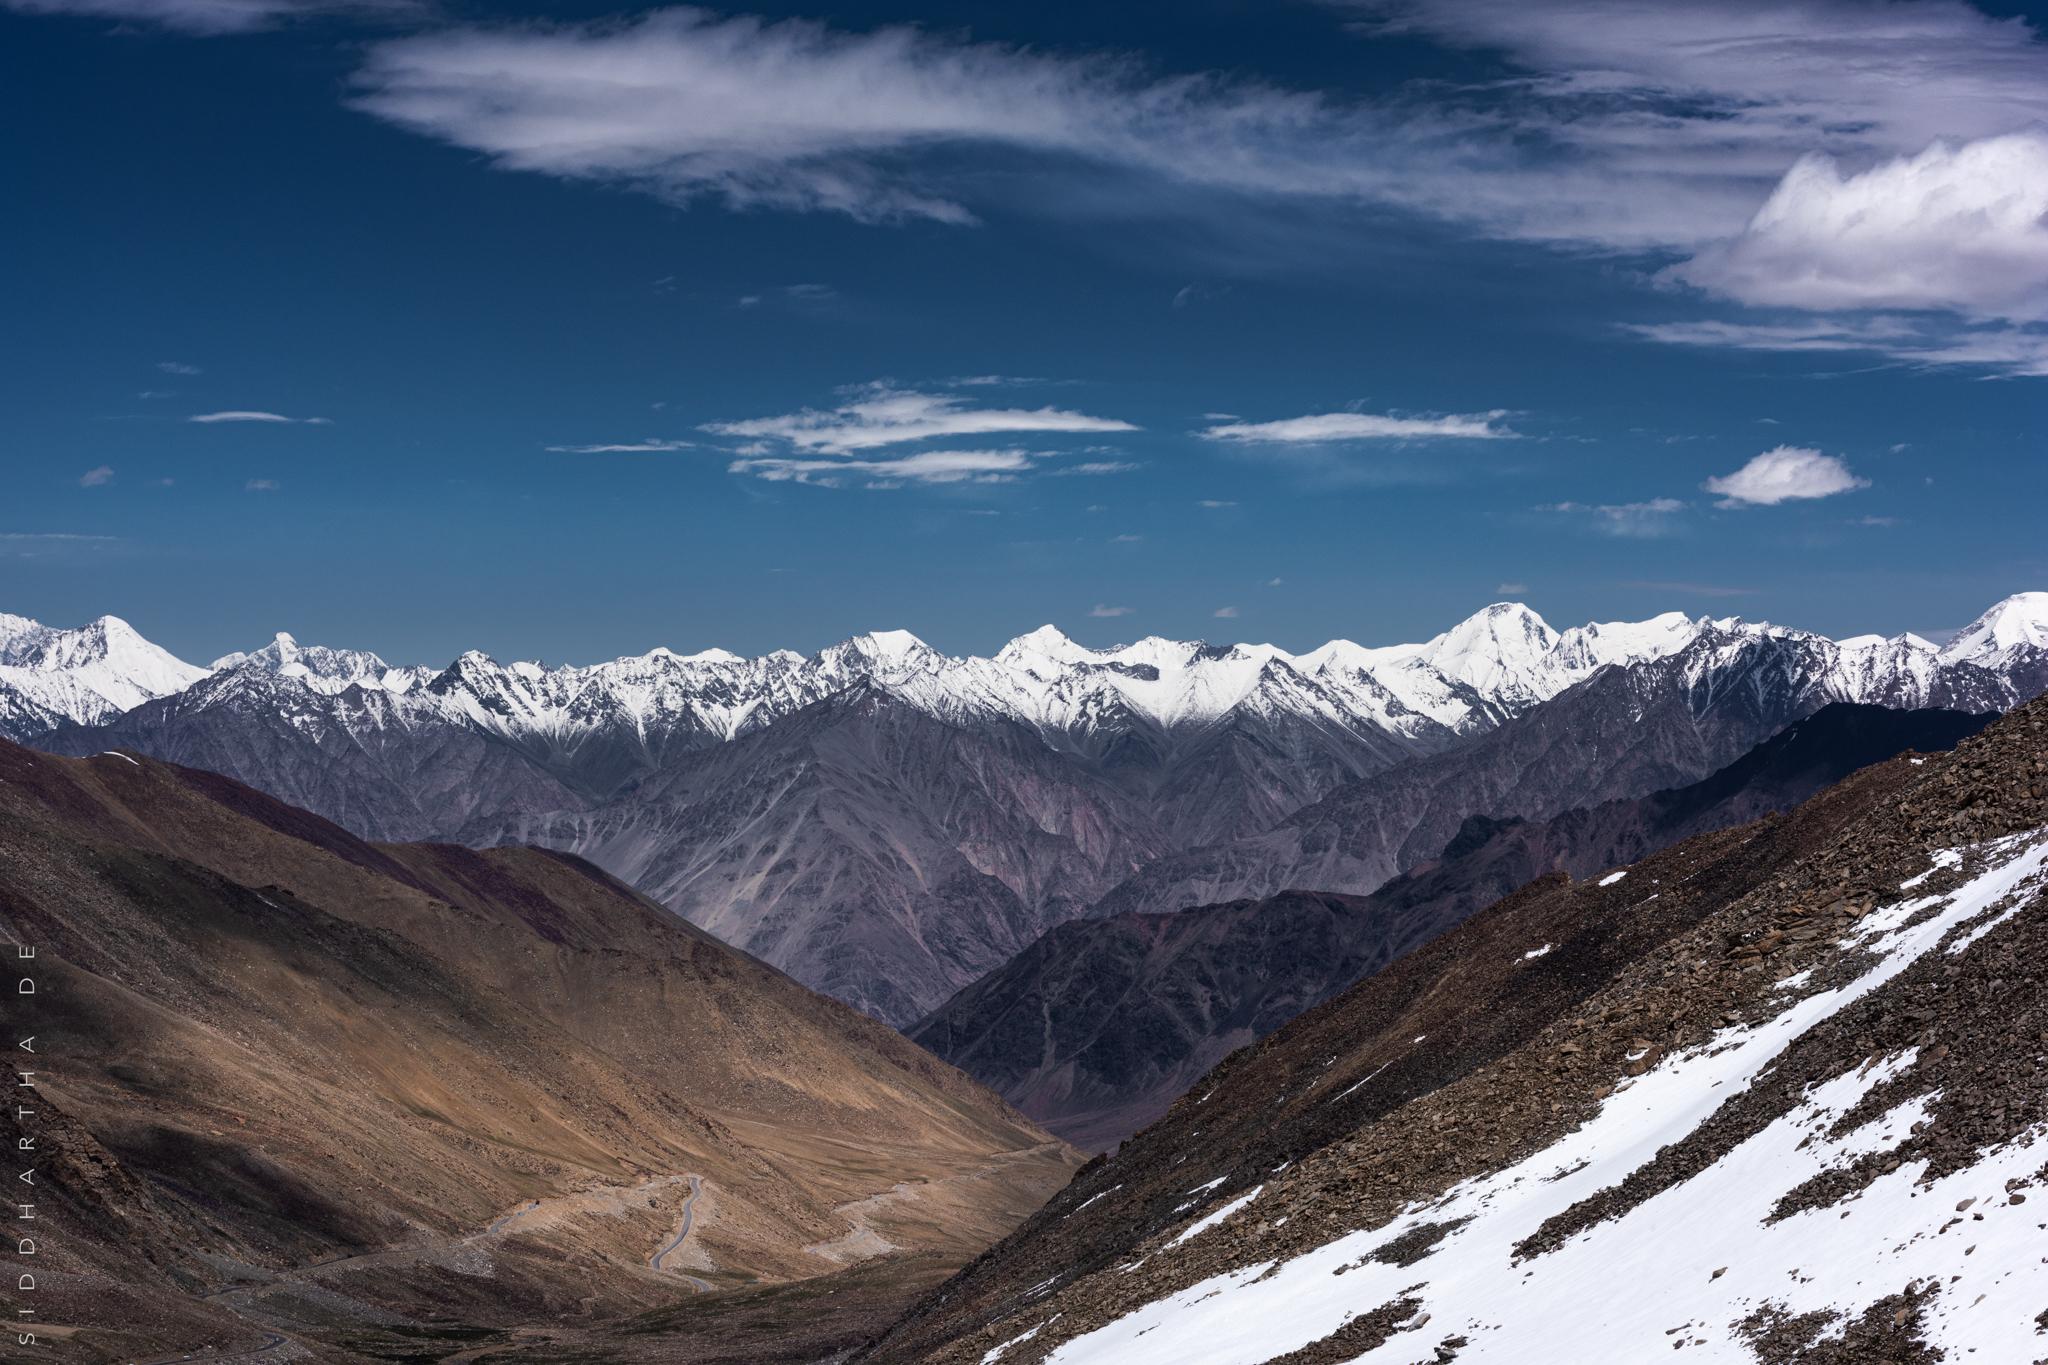 SD Ladakh 2019 13.jpg